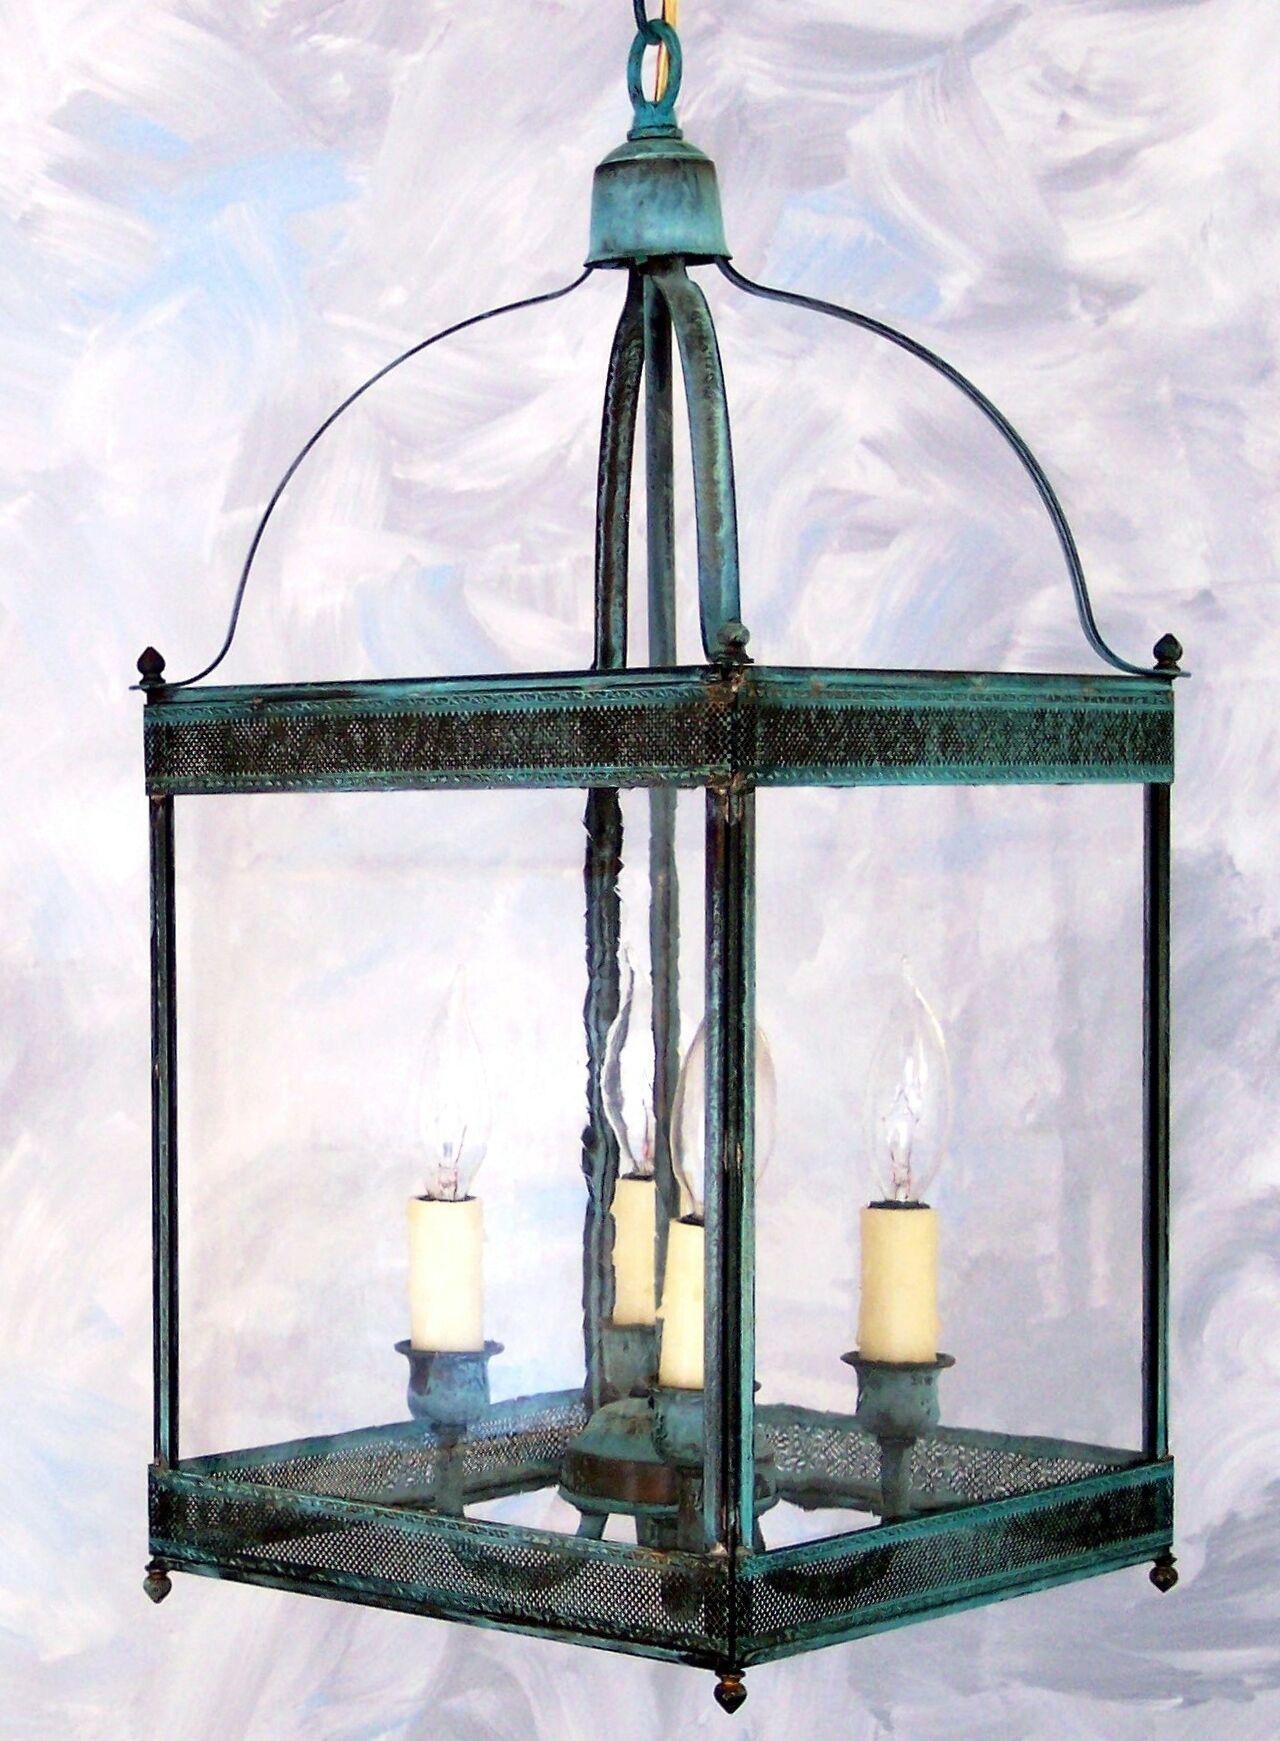 Chearsley 4-Light Foyer Pendant Fixture Finish: Antique Bronze, Shade Color: Drawn Antique